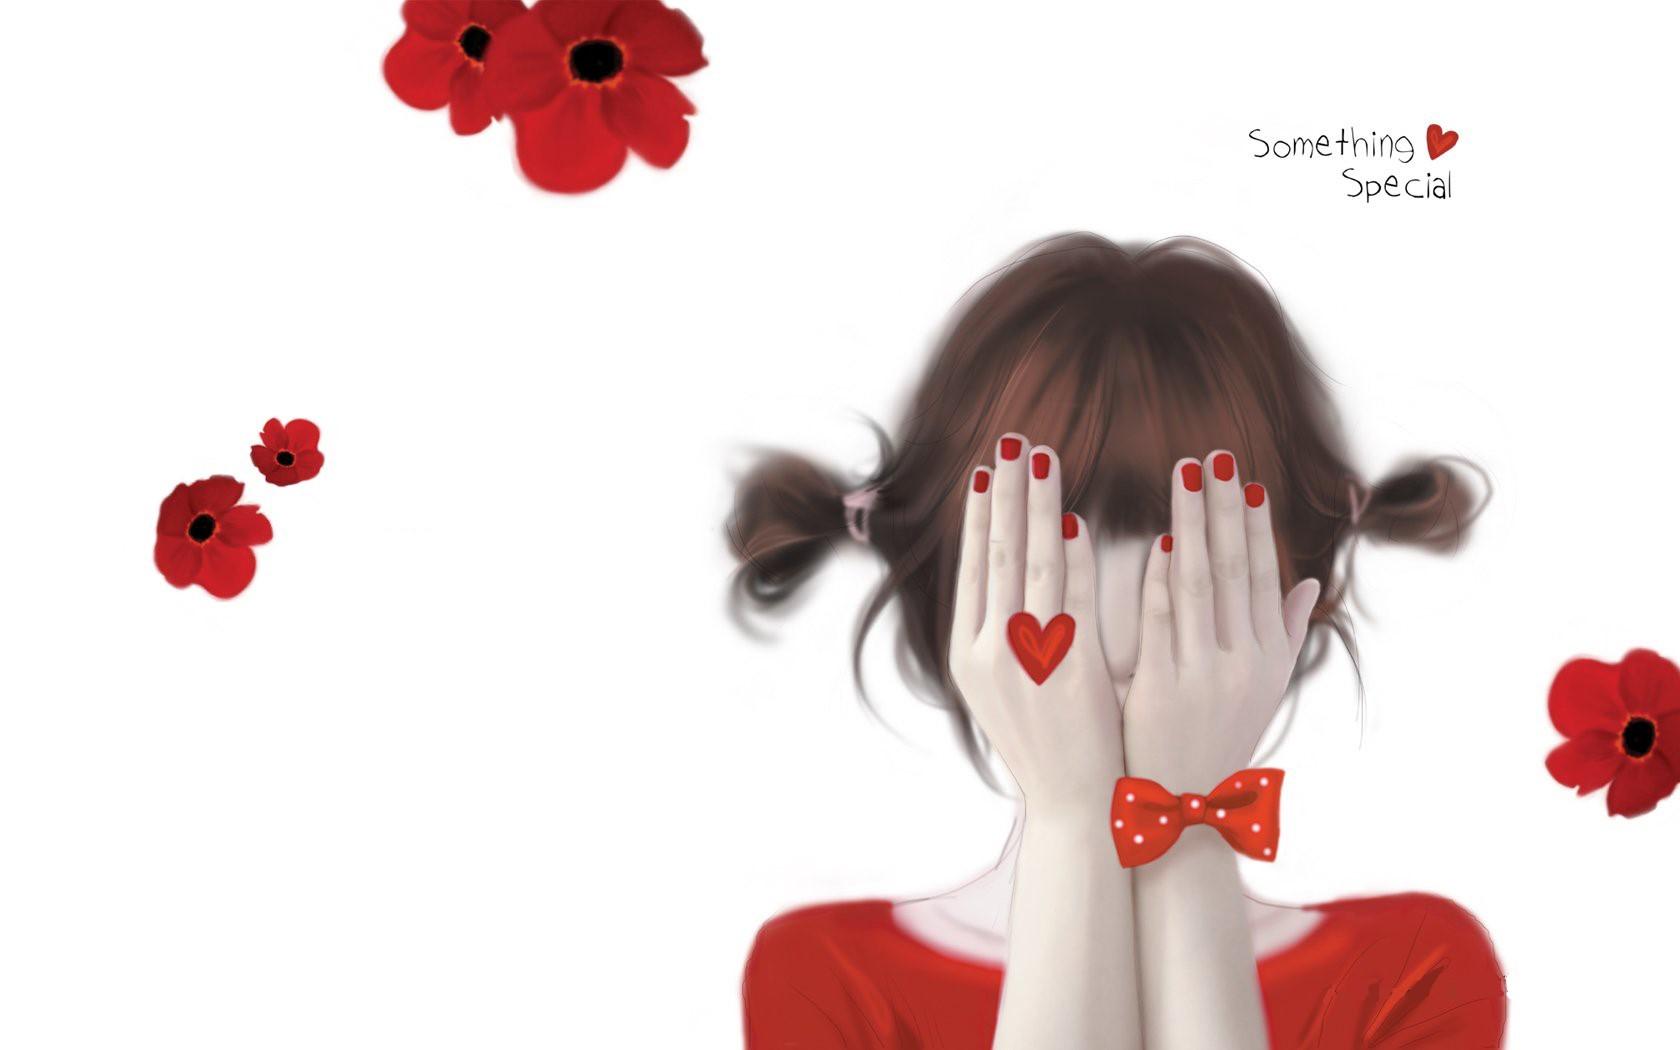 Cute Korean Backgrounds Impressive HDQ Live Images 1680x1050